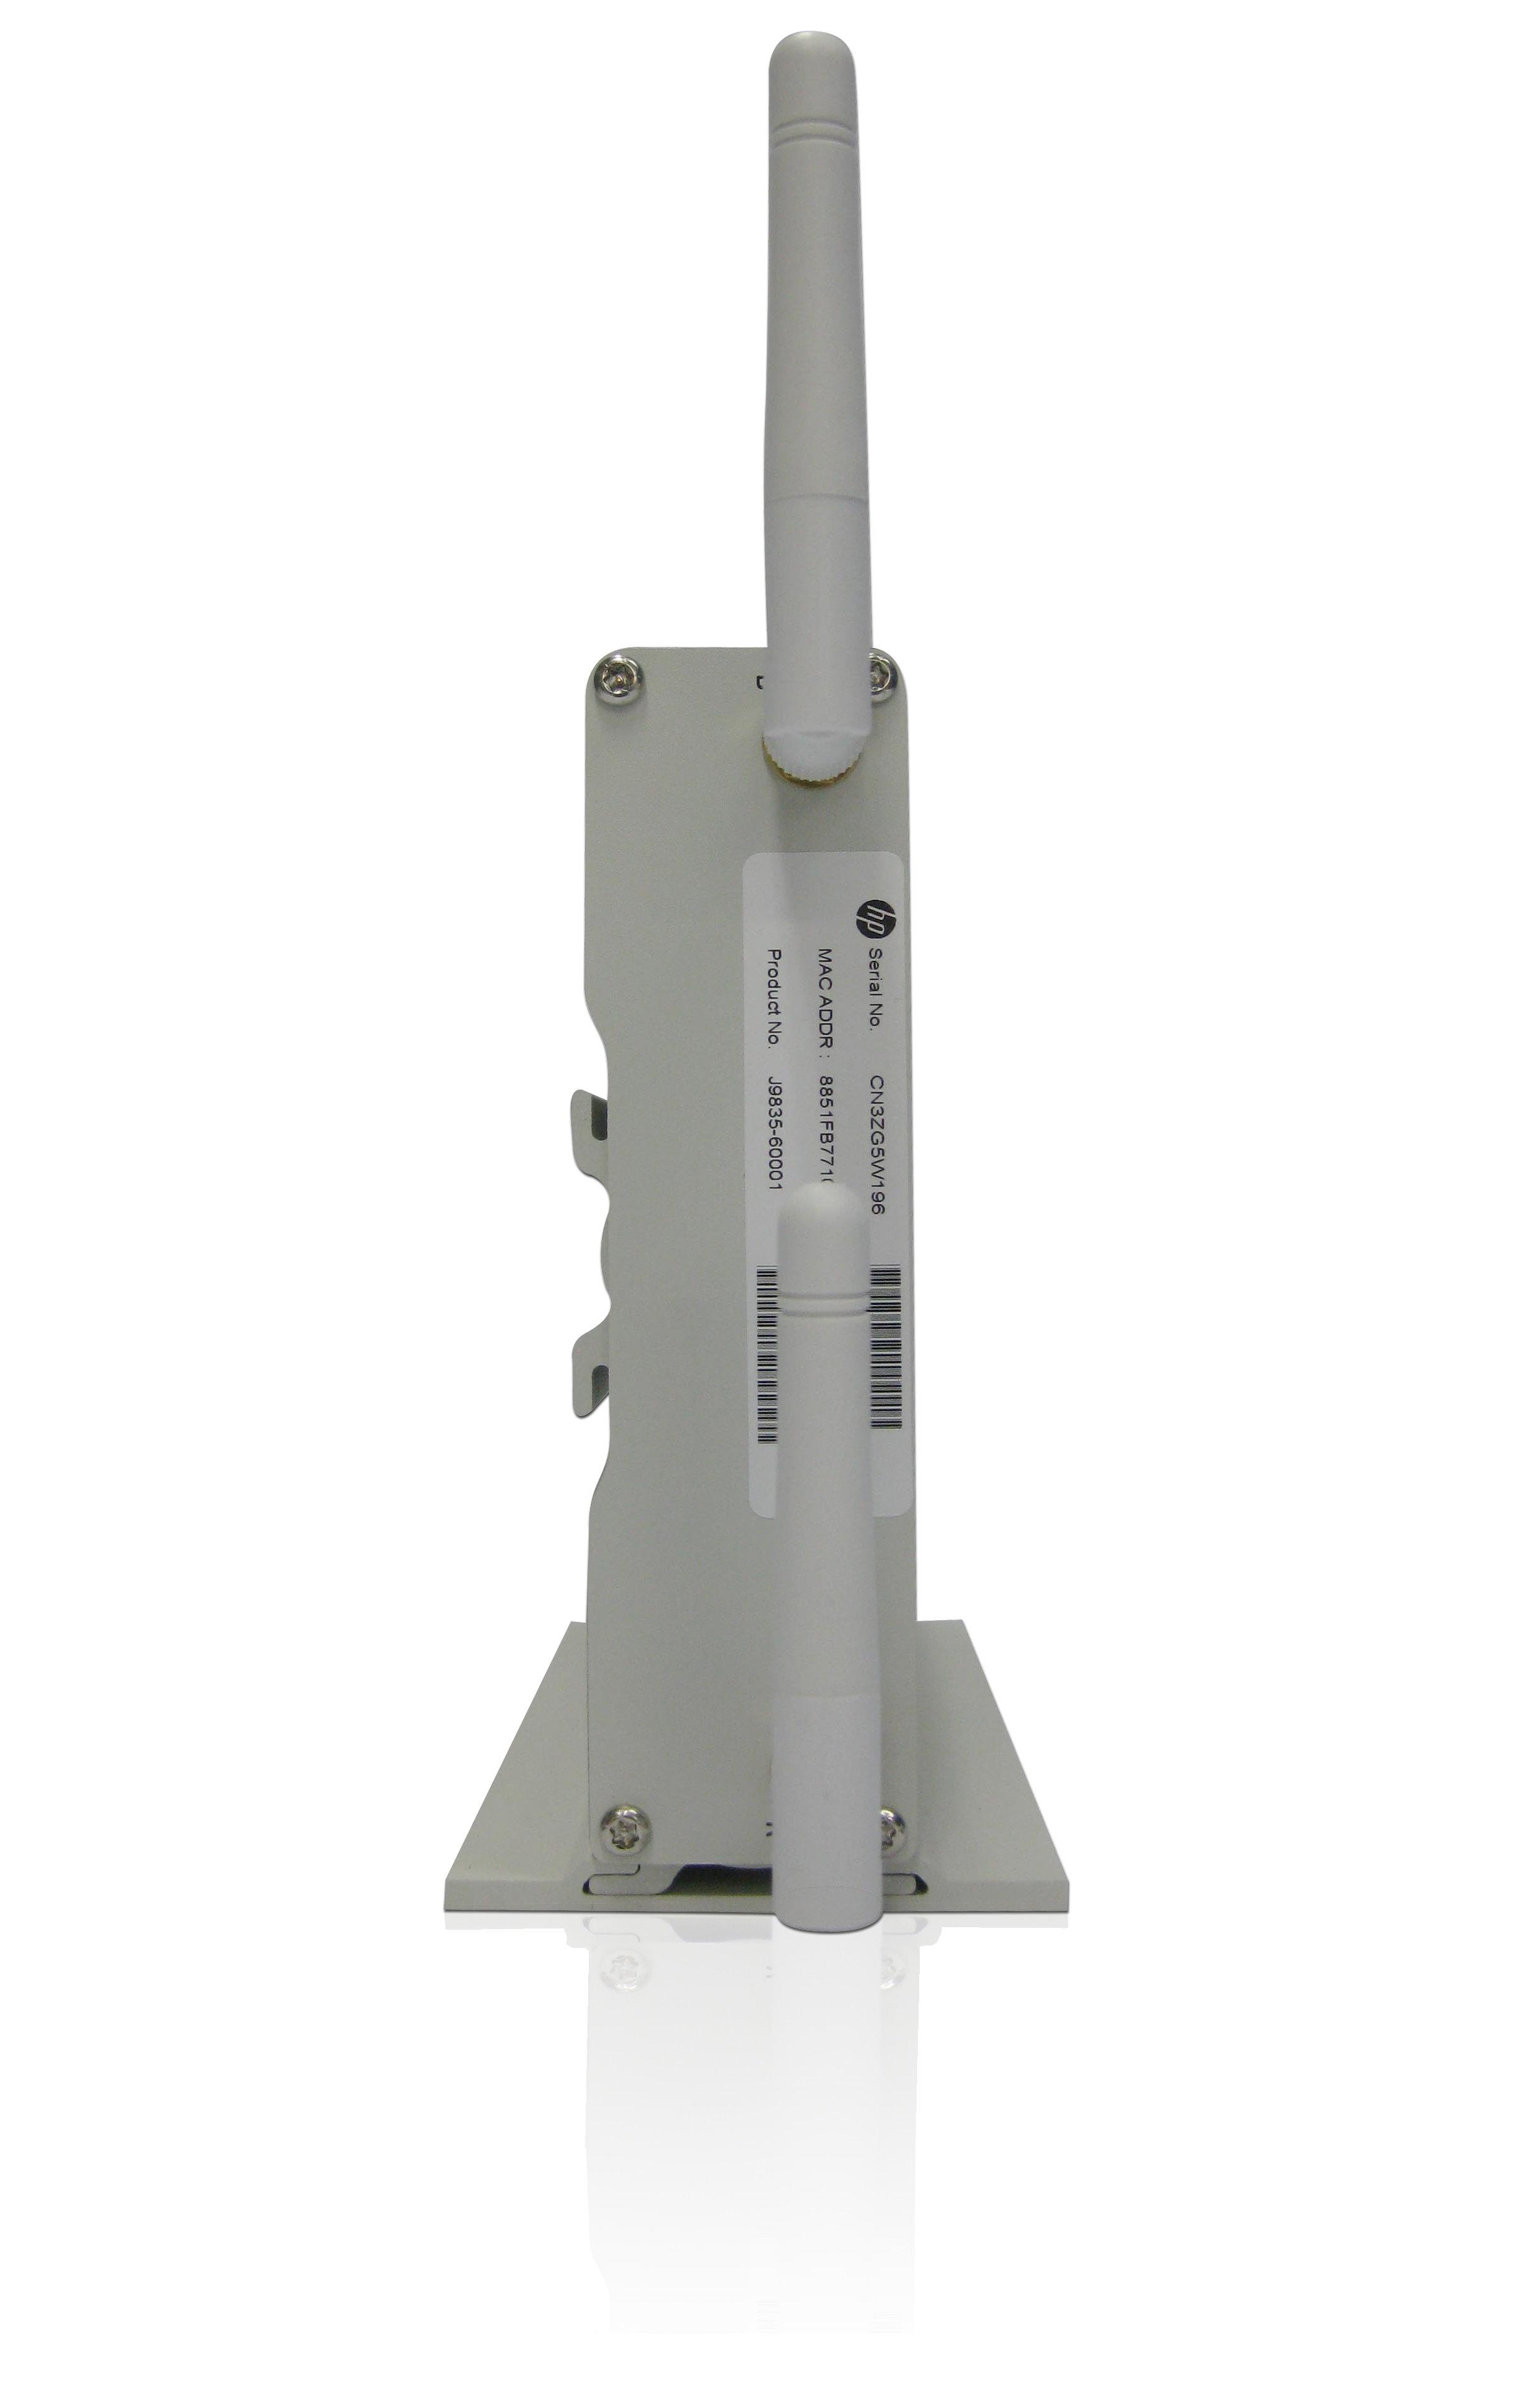 HPE 501 IEEE 802 11ac 1 27 Gbit/s Wireless Bridge